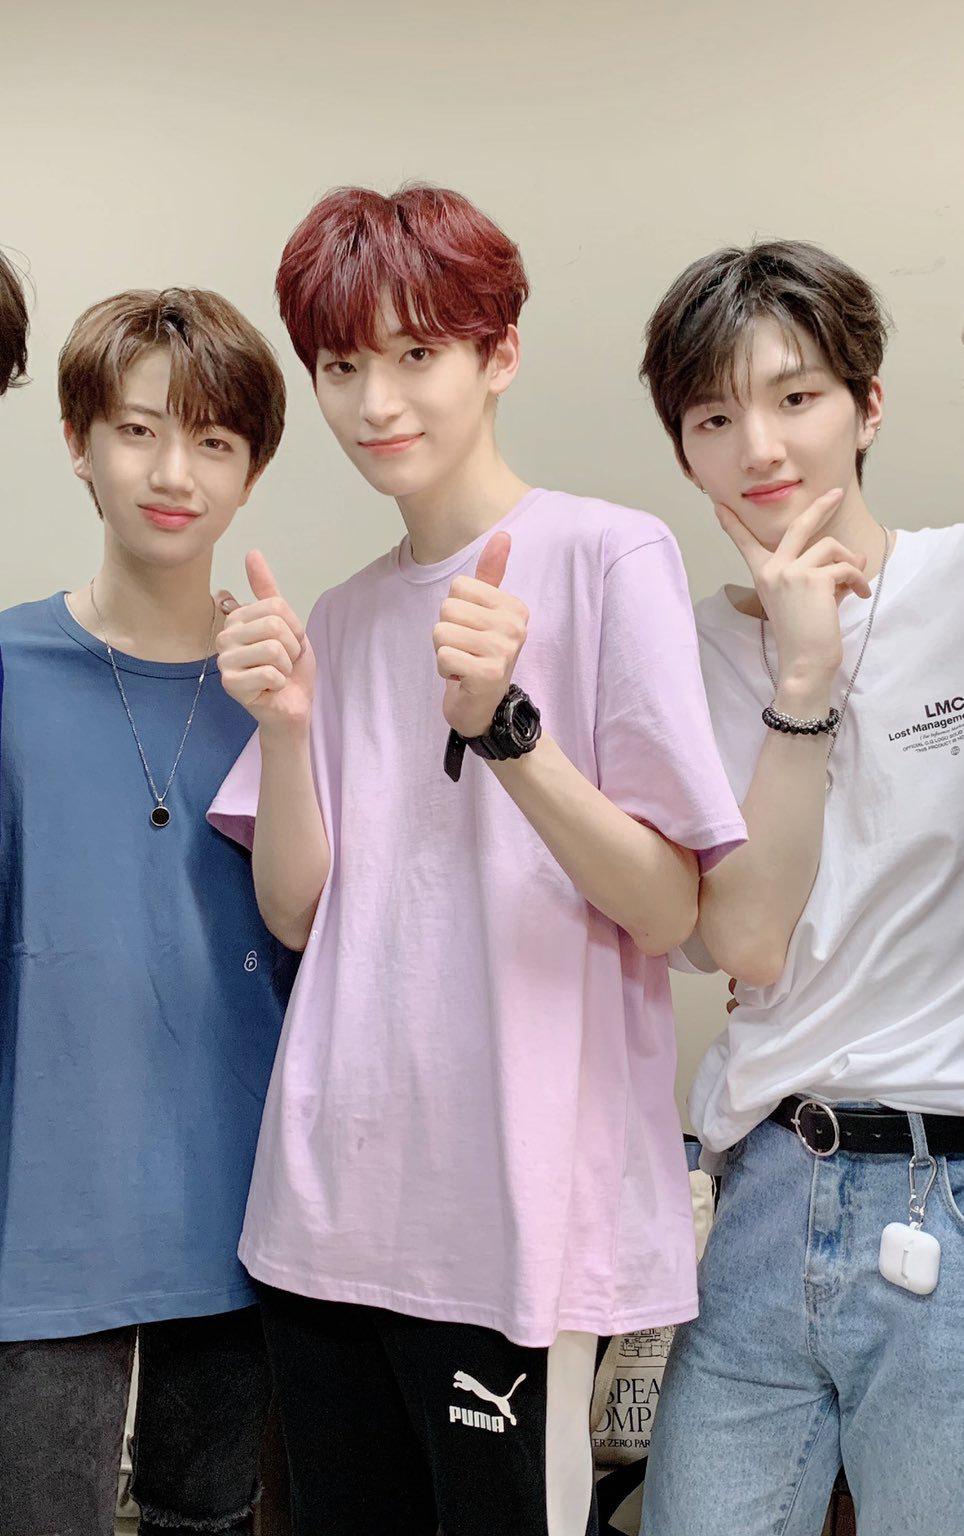 produce x 101, koo jungmo, ham wonjin, moon hyunbin, debut, starship new boy group, starship monsta x,